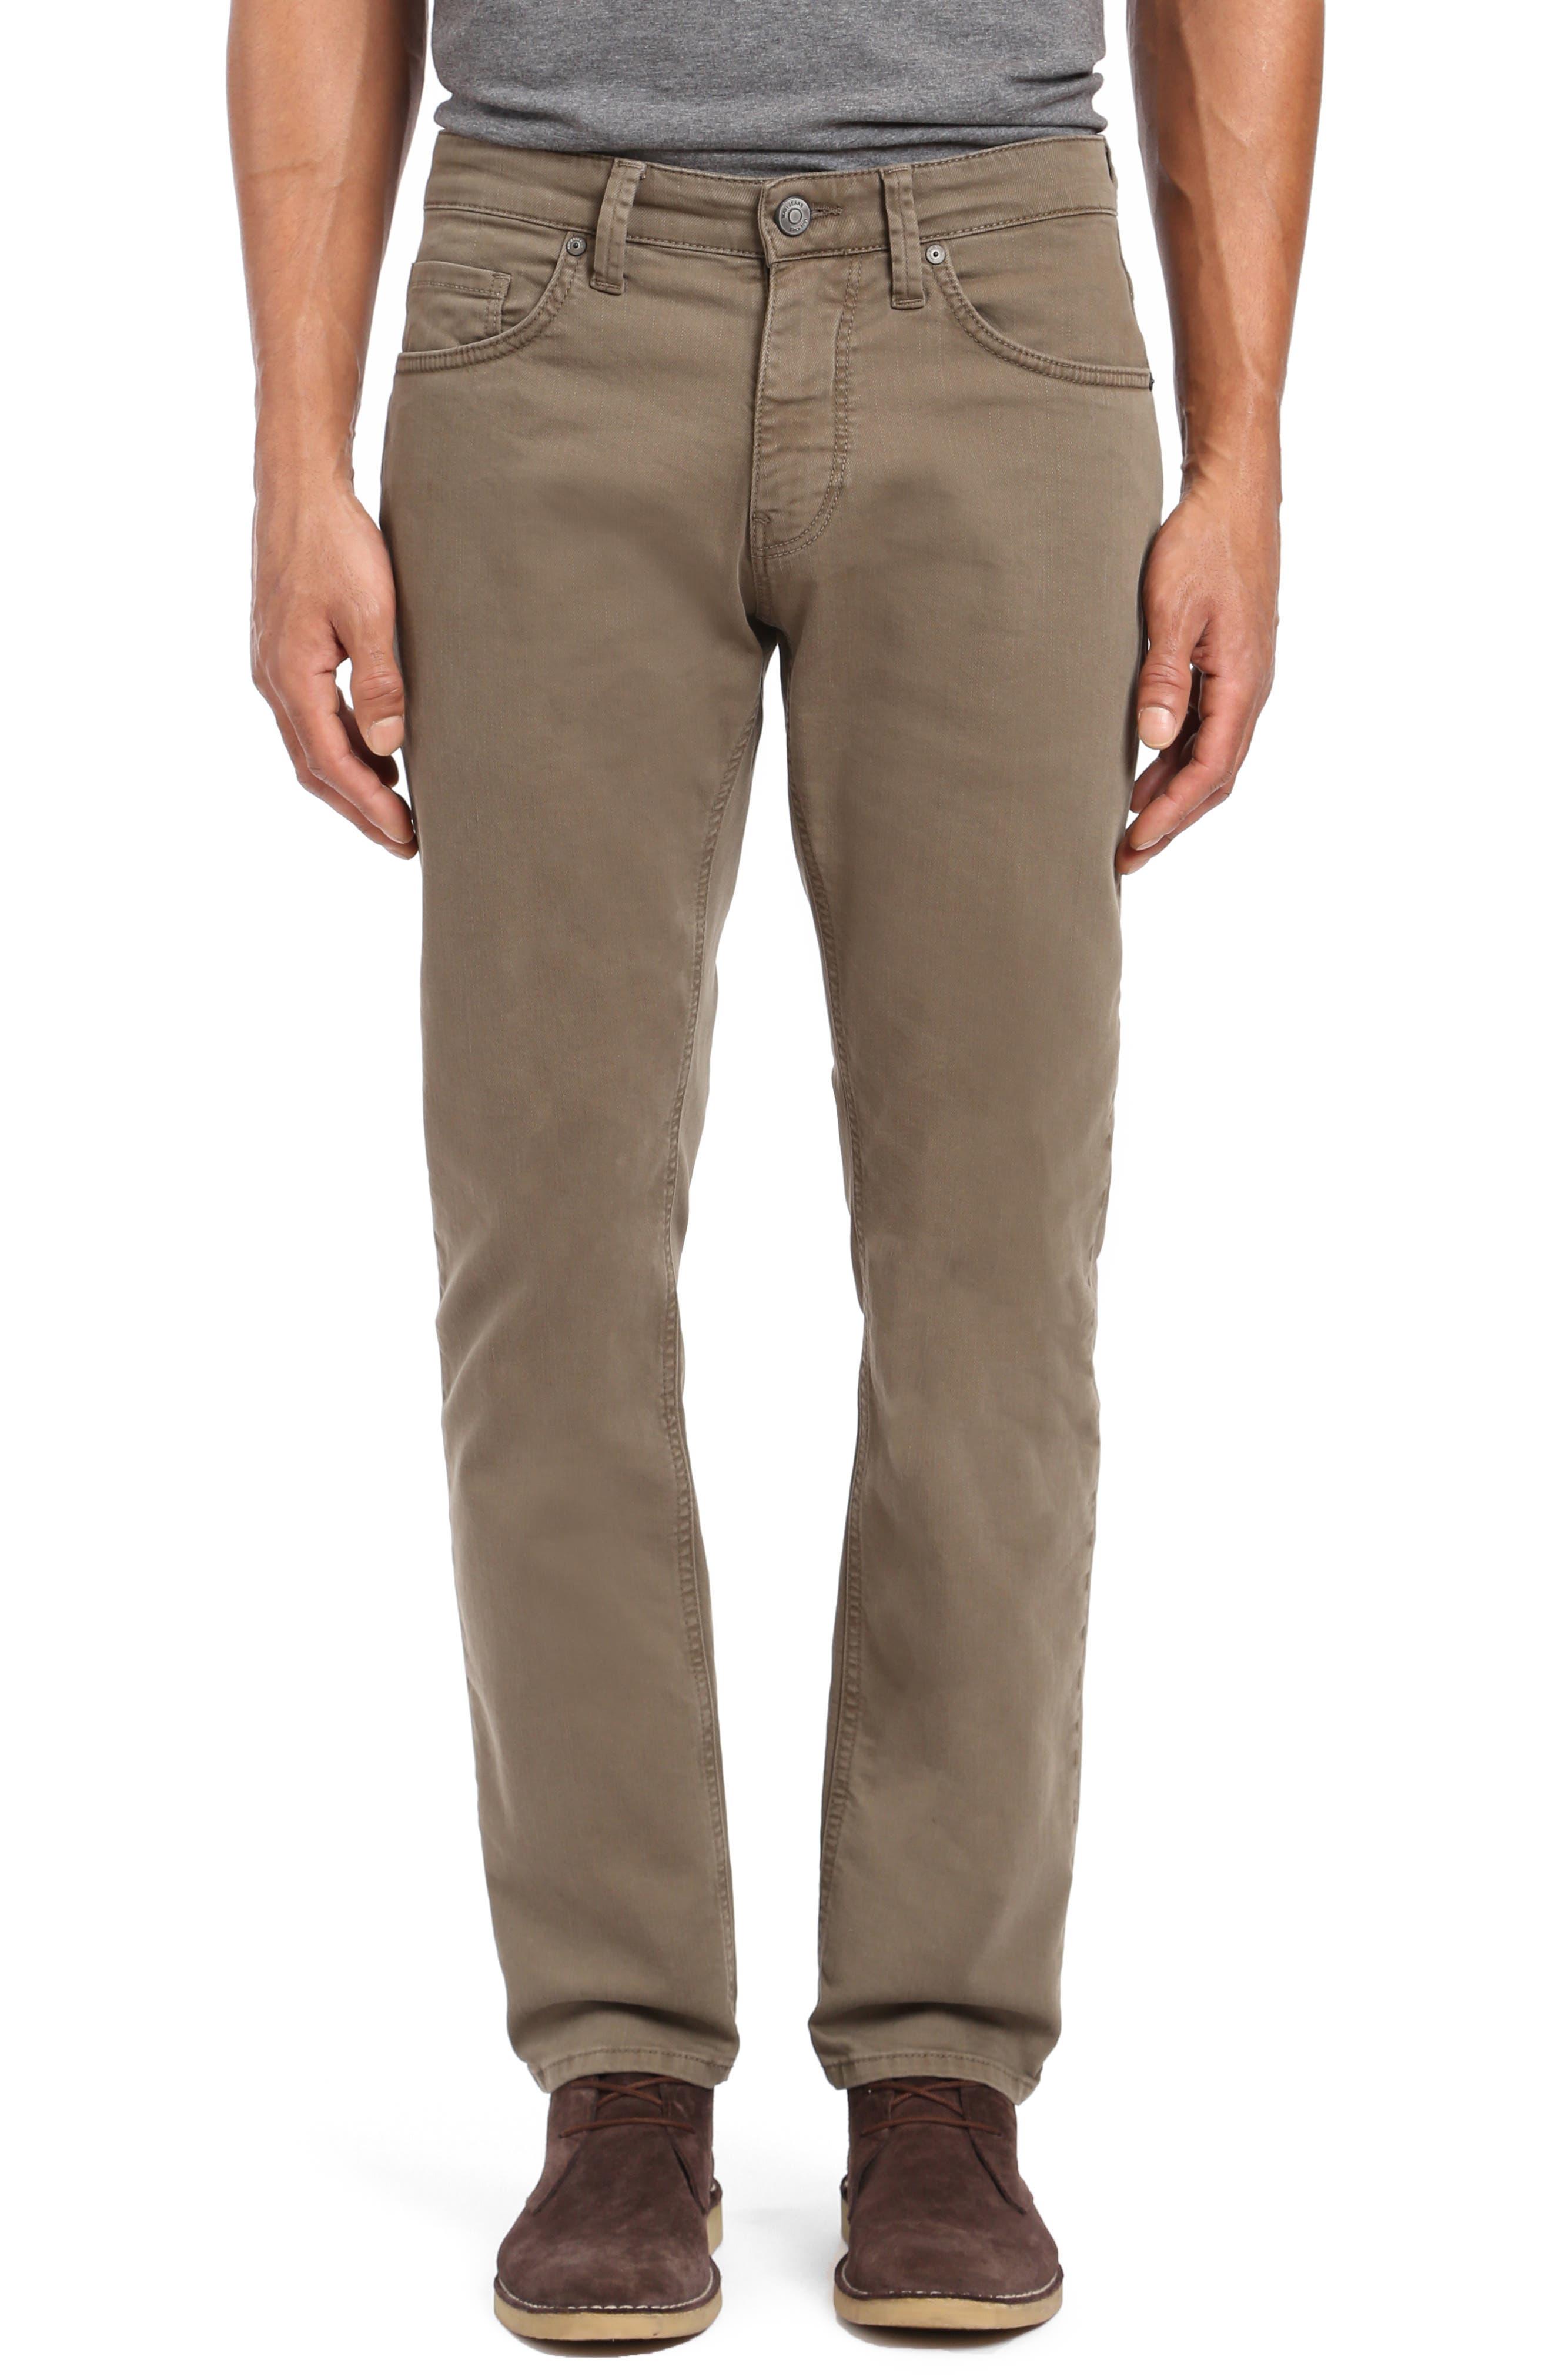 MAVI JEANS Zach Straight Leg Jeans in Khaki Washed Comfort